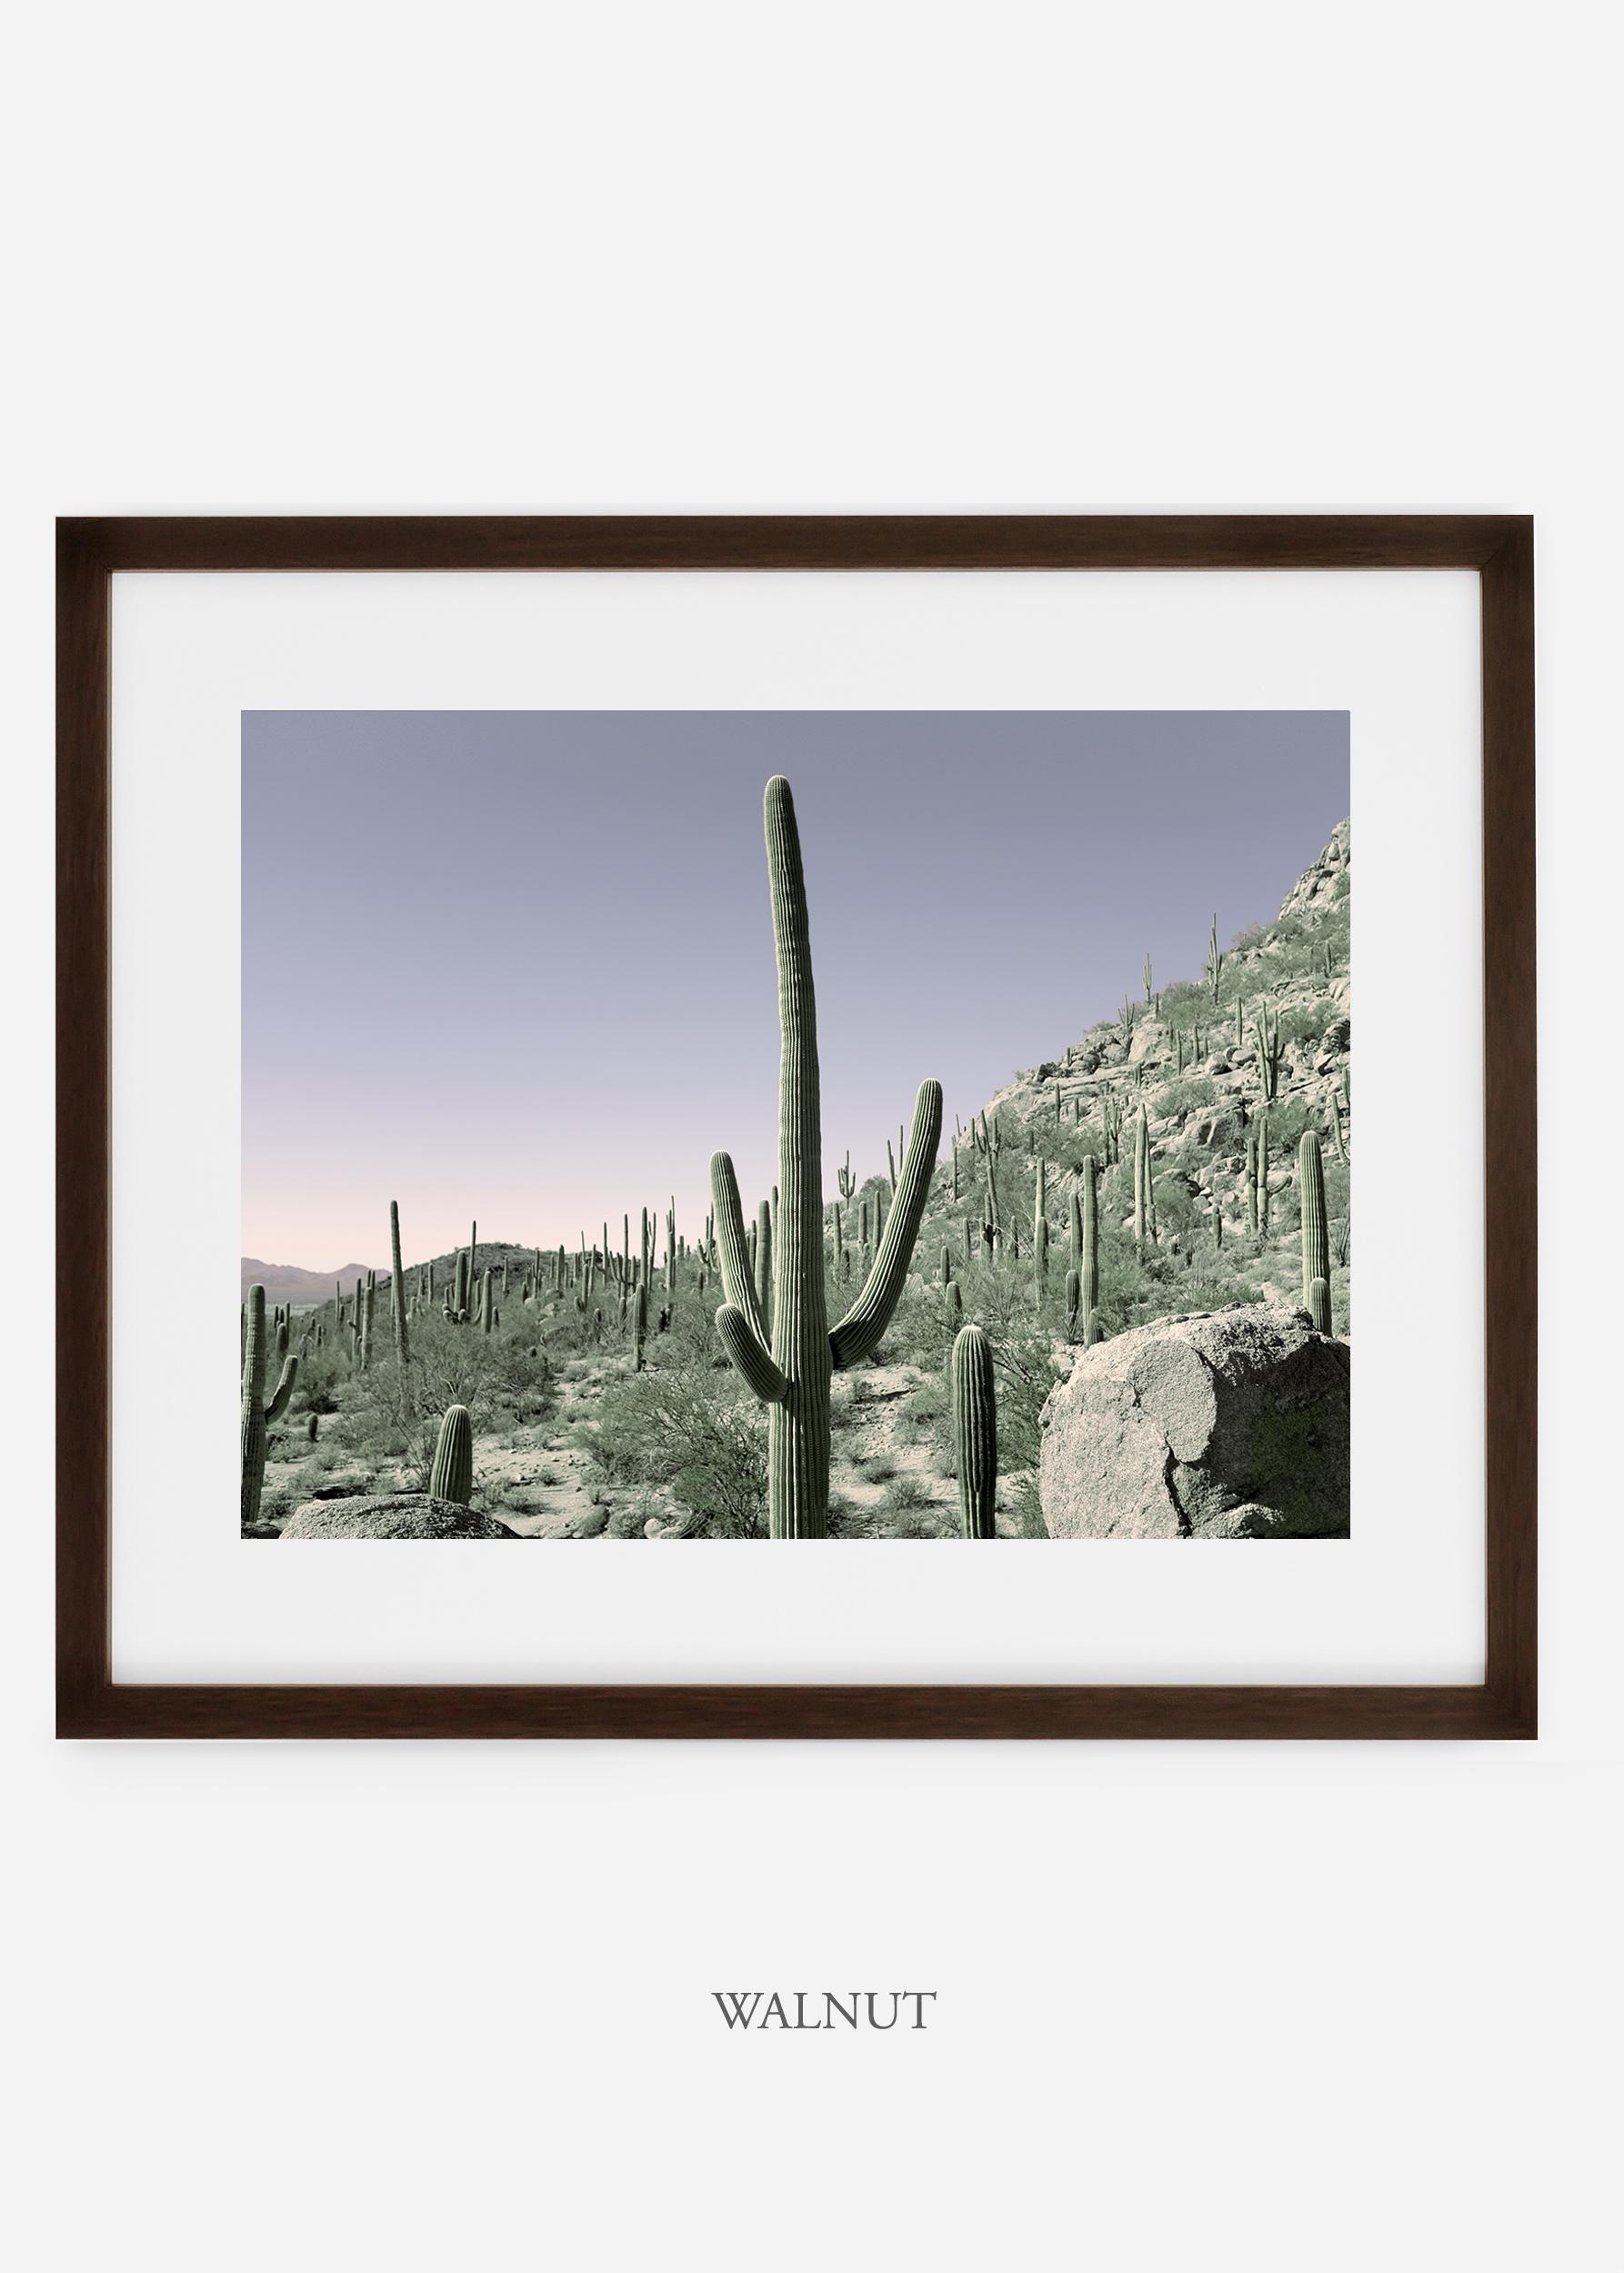 walnutframe-saguaroNo.13-wildercalifornia-art-wallart-cactusprint-homedecor-prints-arizona-botanical-artwork-interiordesign.jpg